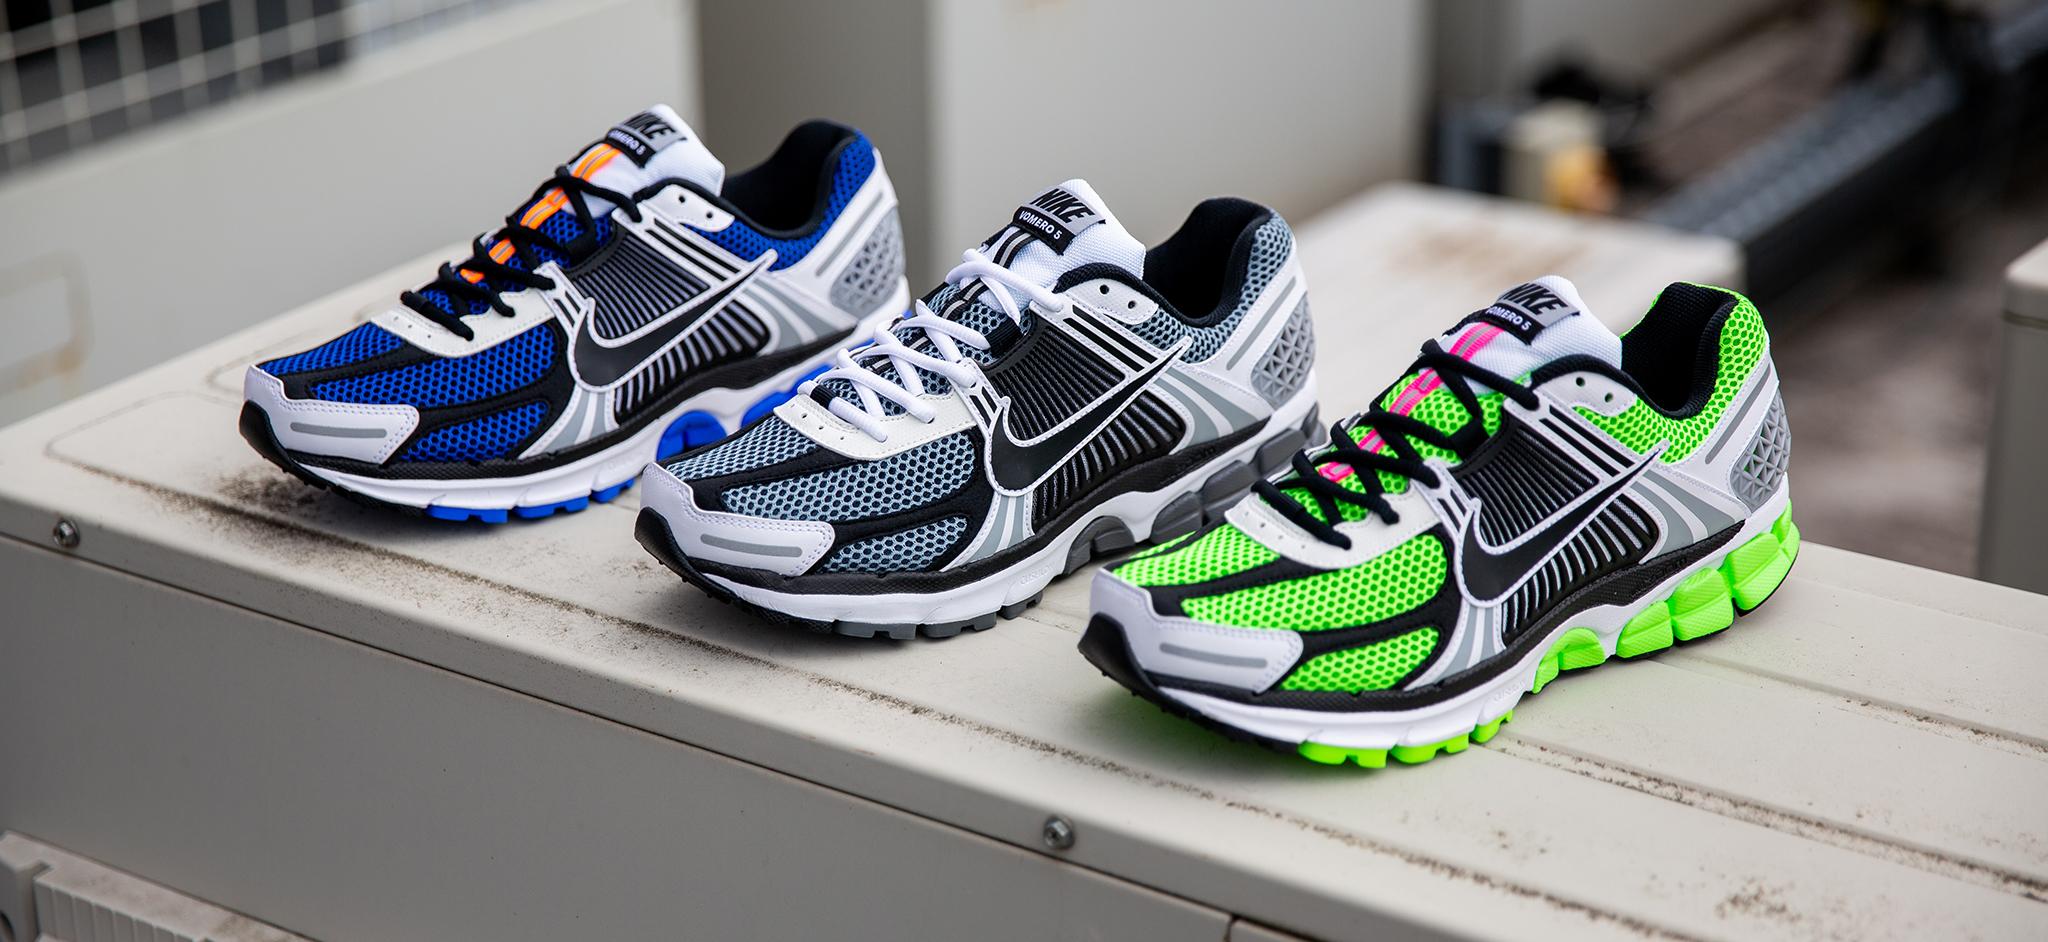 3991cb1f79c036 Nike Zoom Vomero 5 SE SP